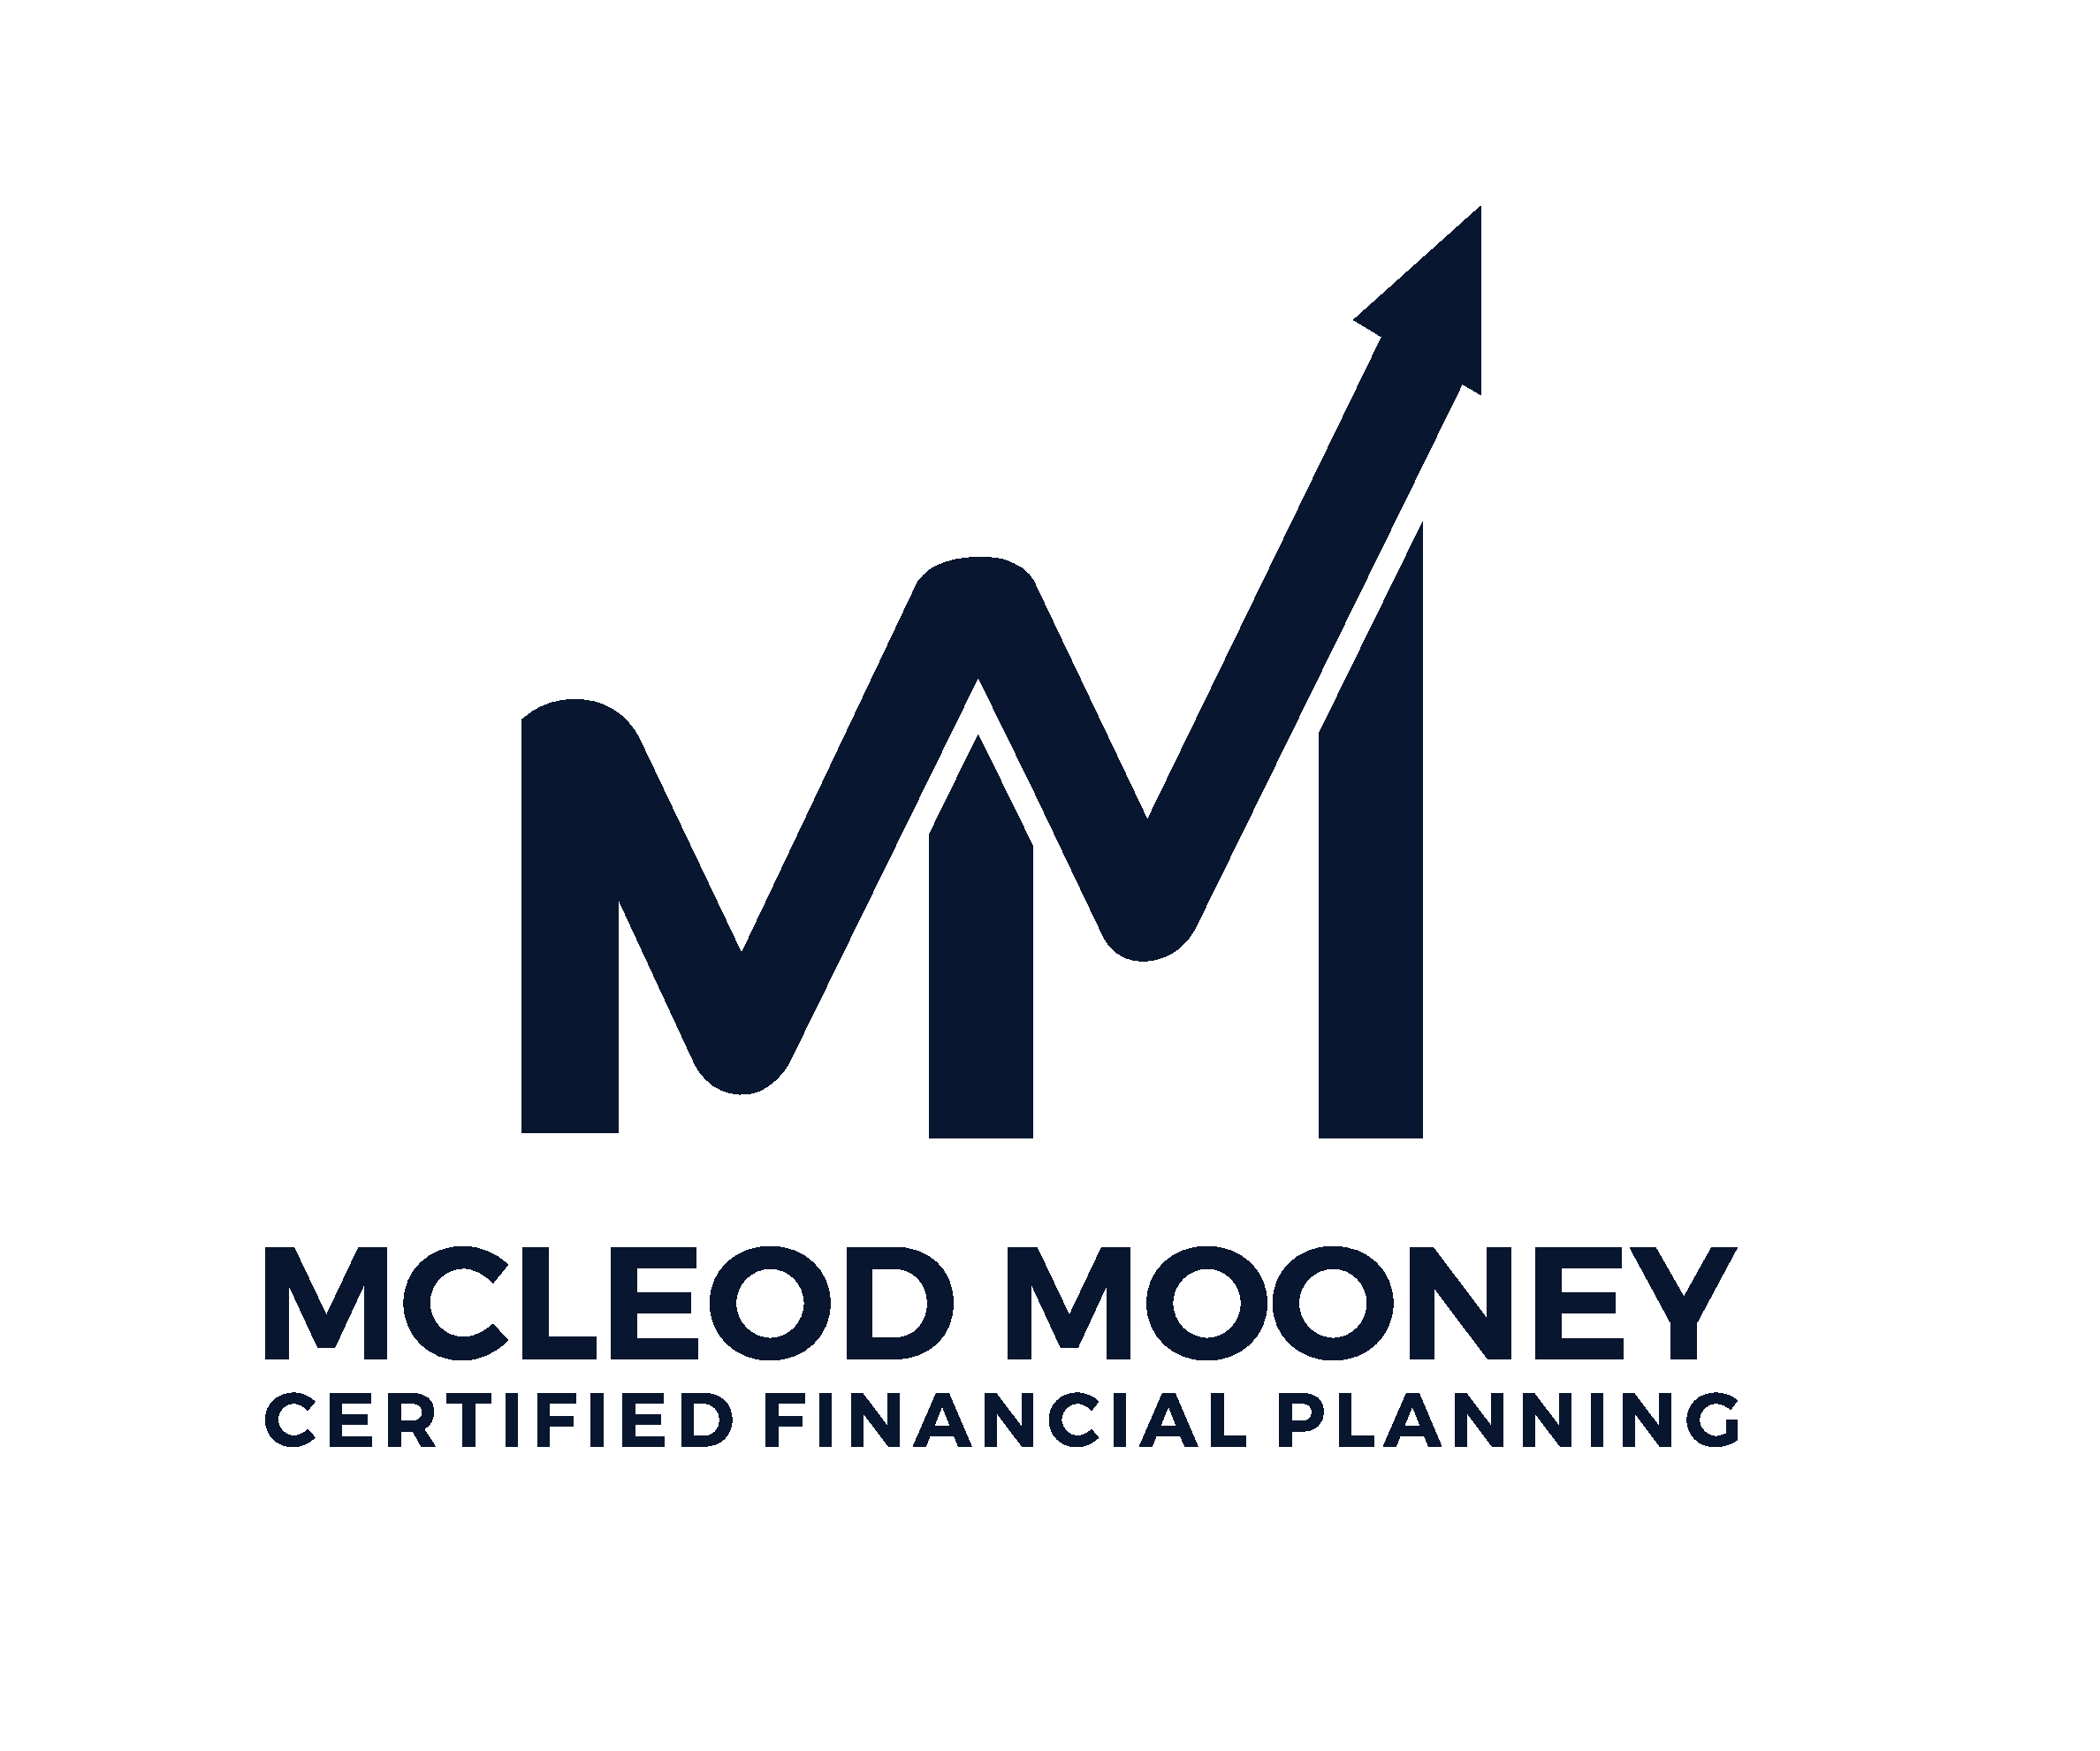 McLeod Mooney